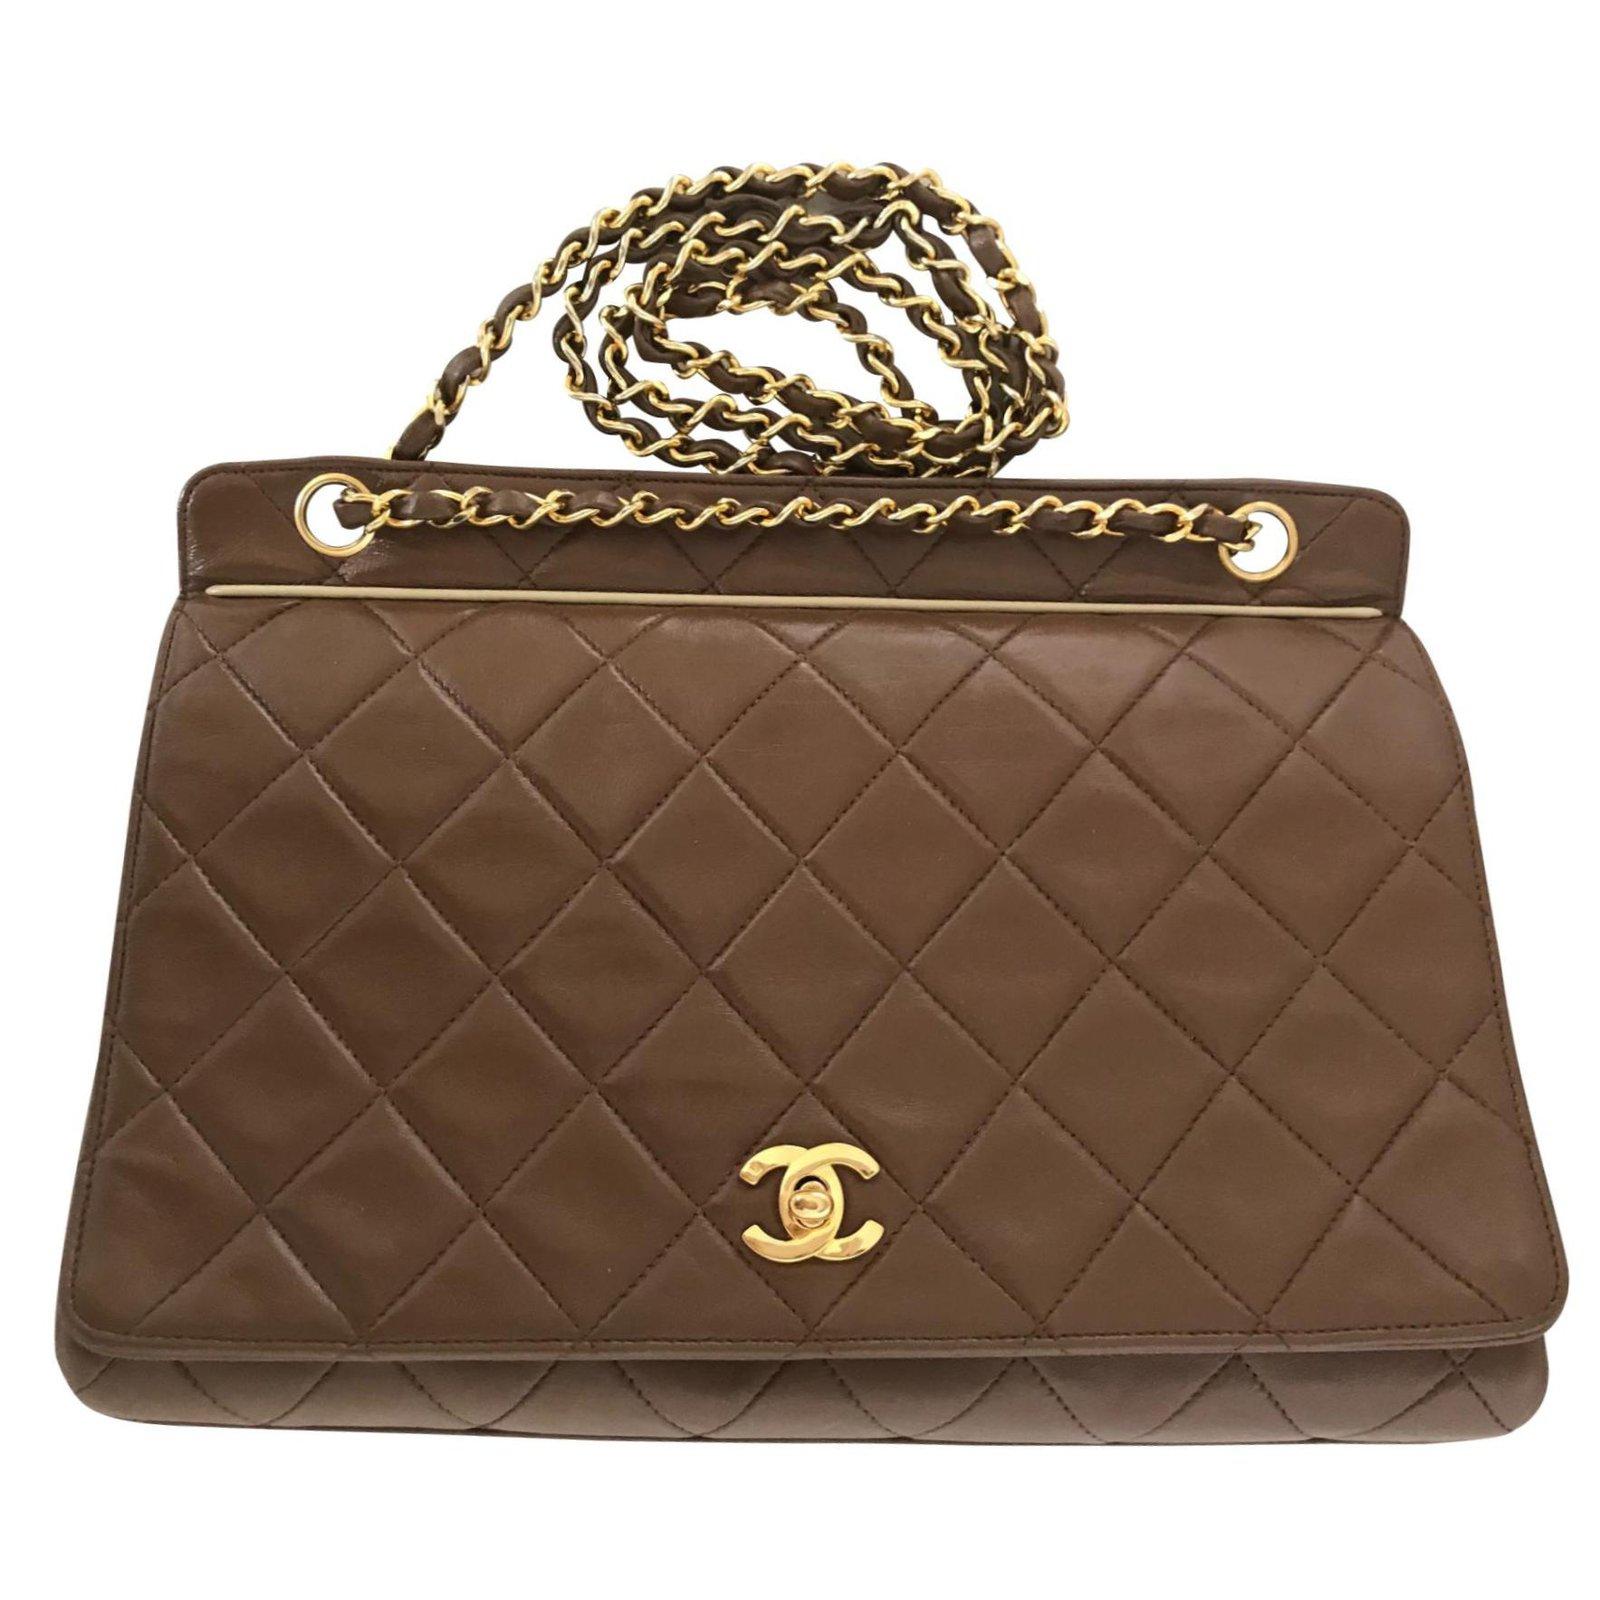 575c7420f136f2 Chanel Handbag Handbags Lambskin Caramel ref.103996 - Joli Closet